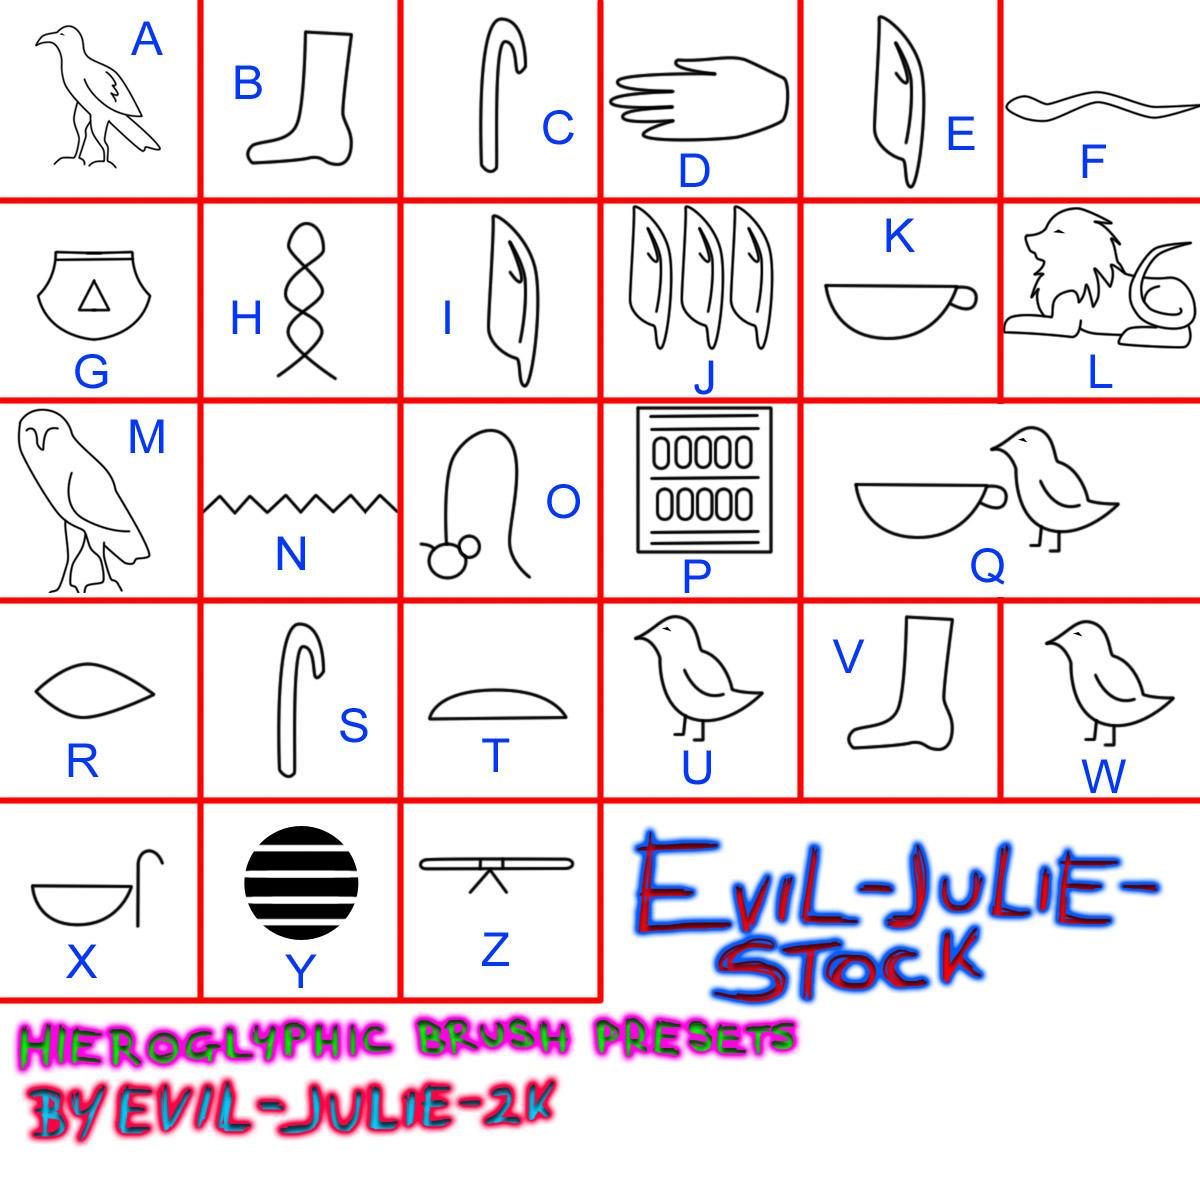 Hieroglyph Bruses by Evil-Julie-Stock